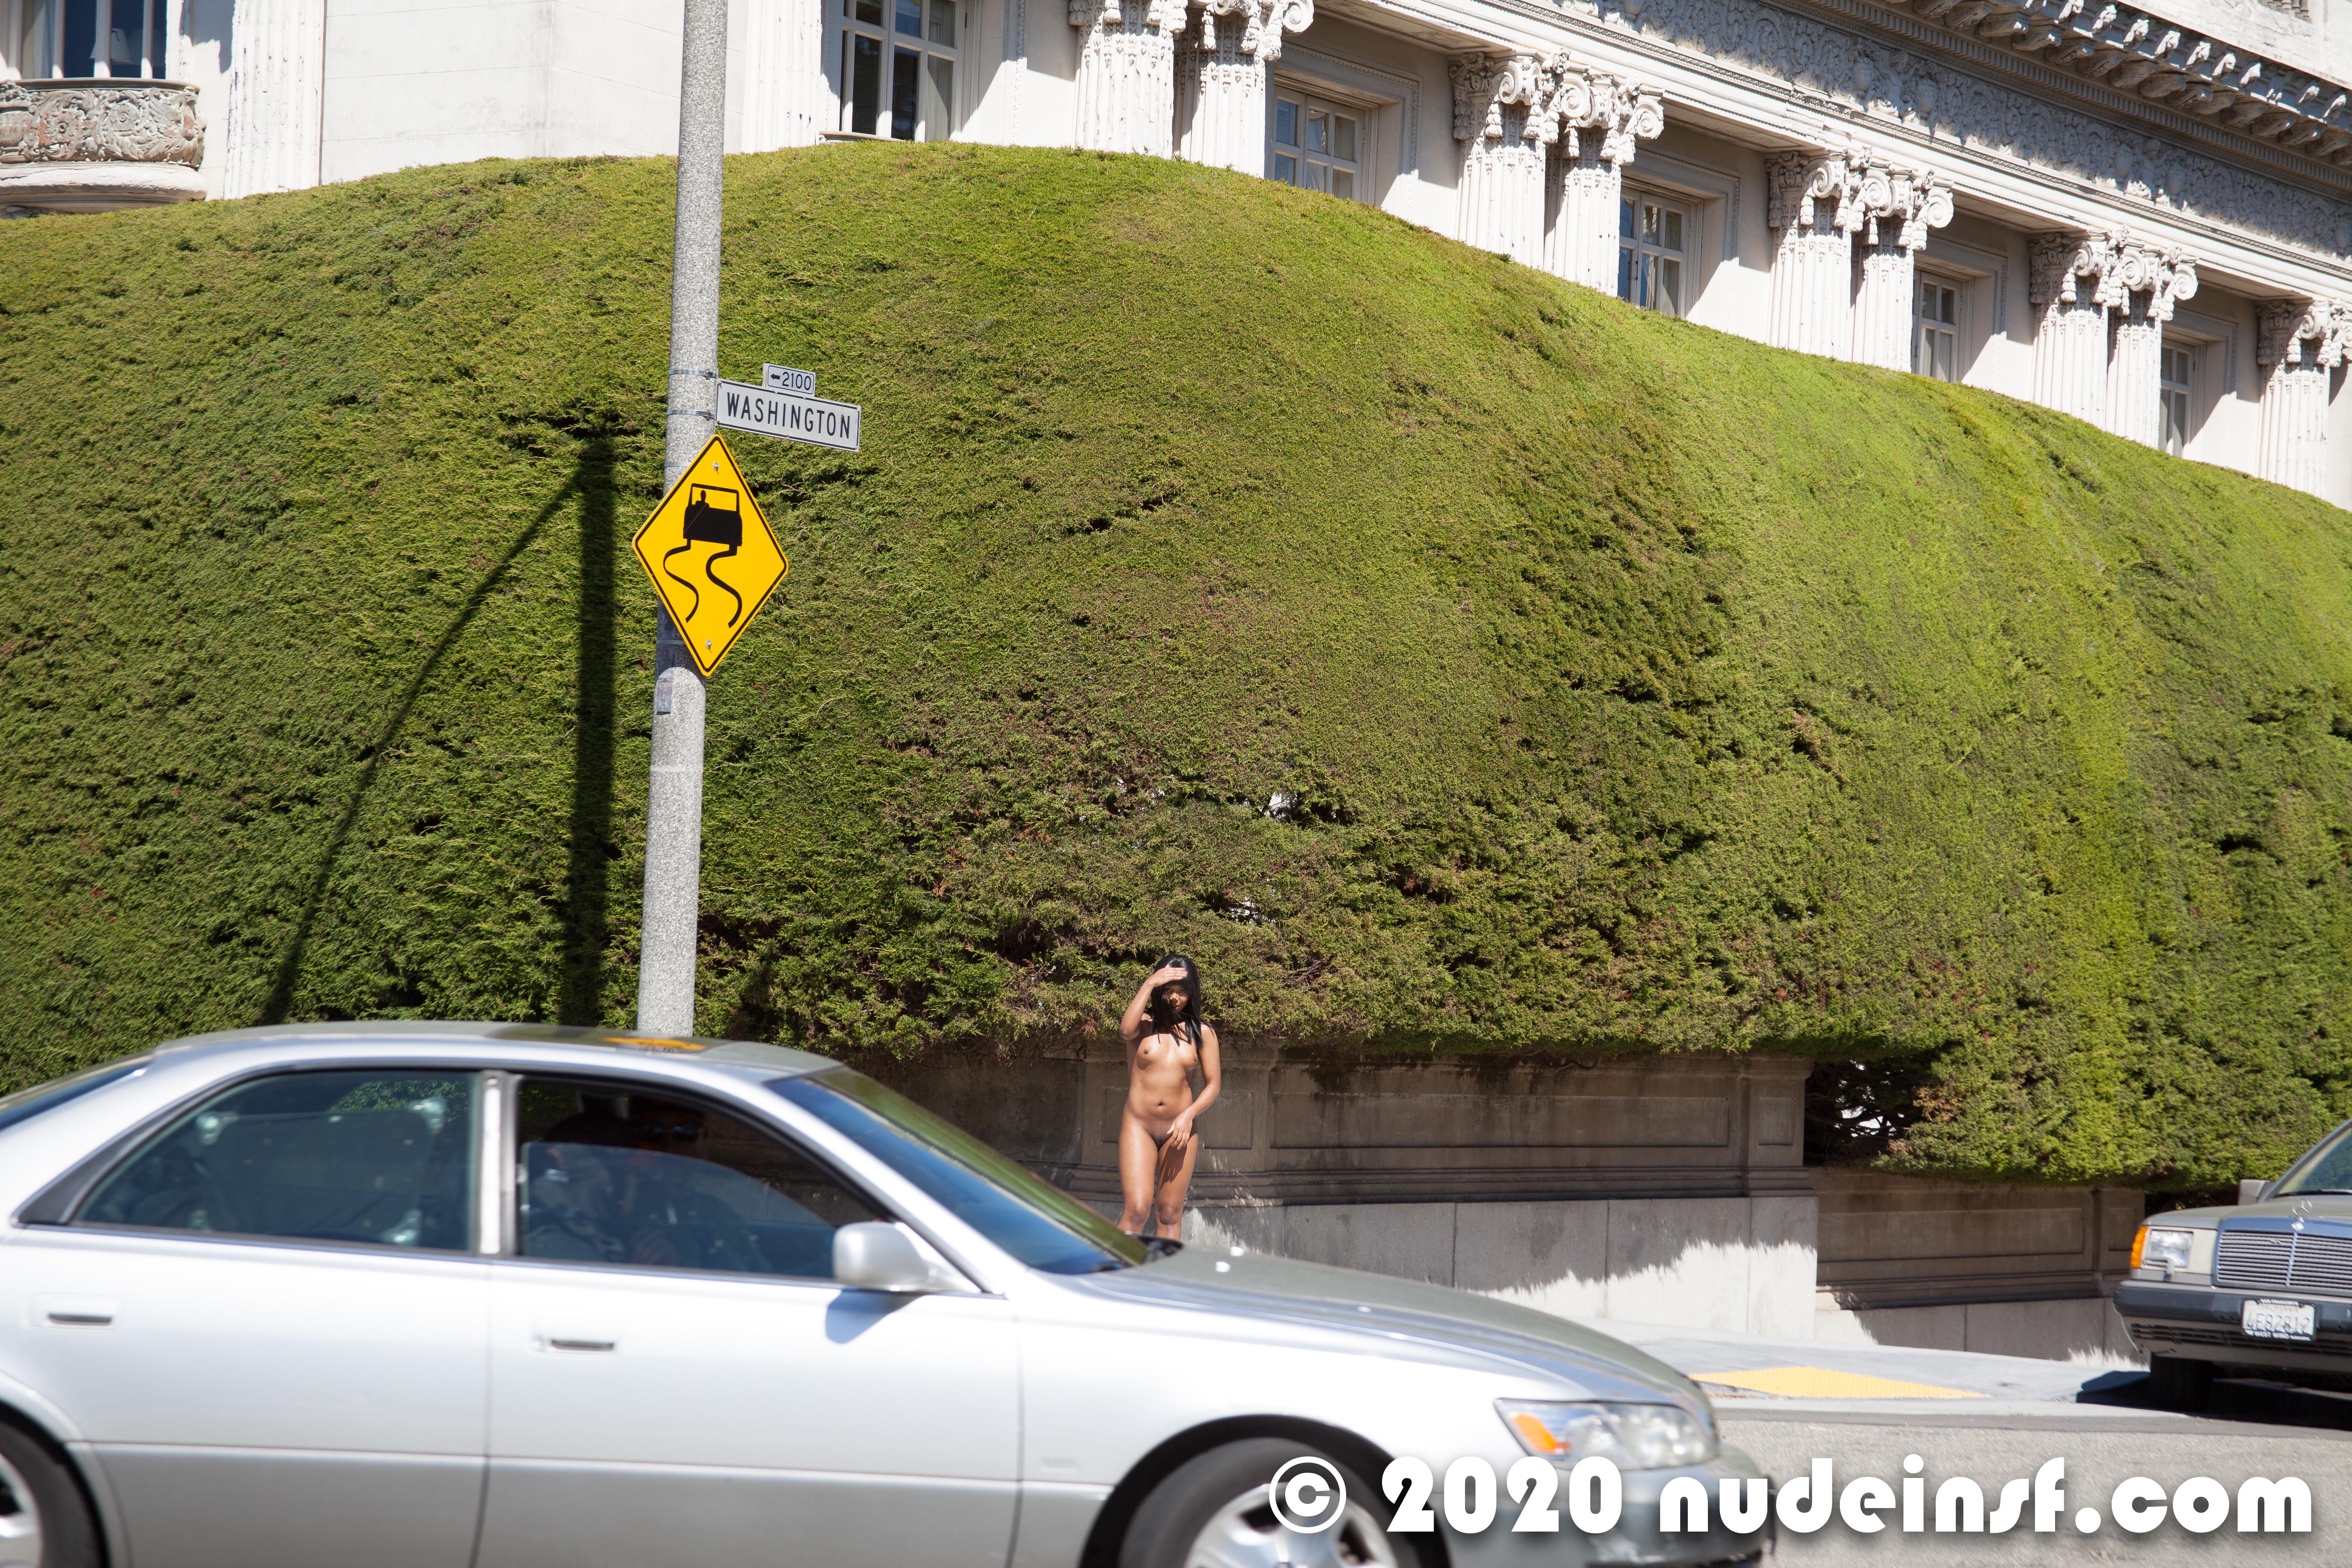 Kitkat club public nudity in germany by snahbrandy 4